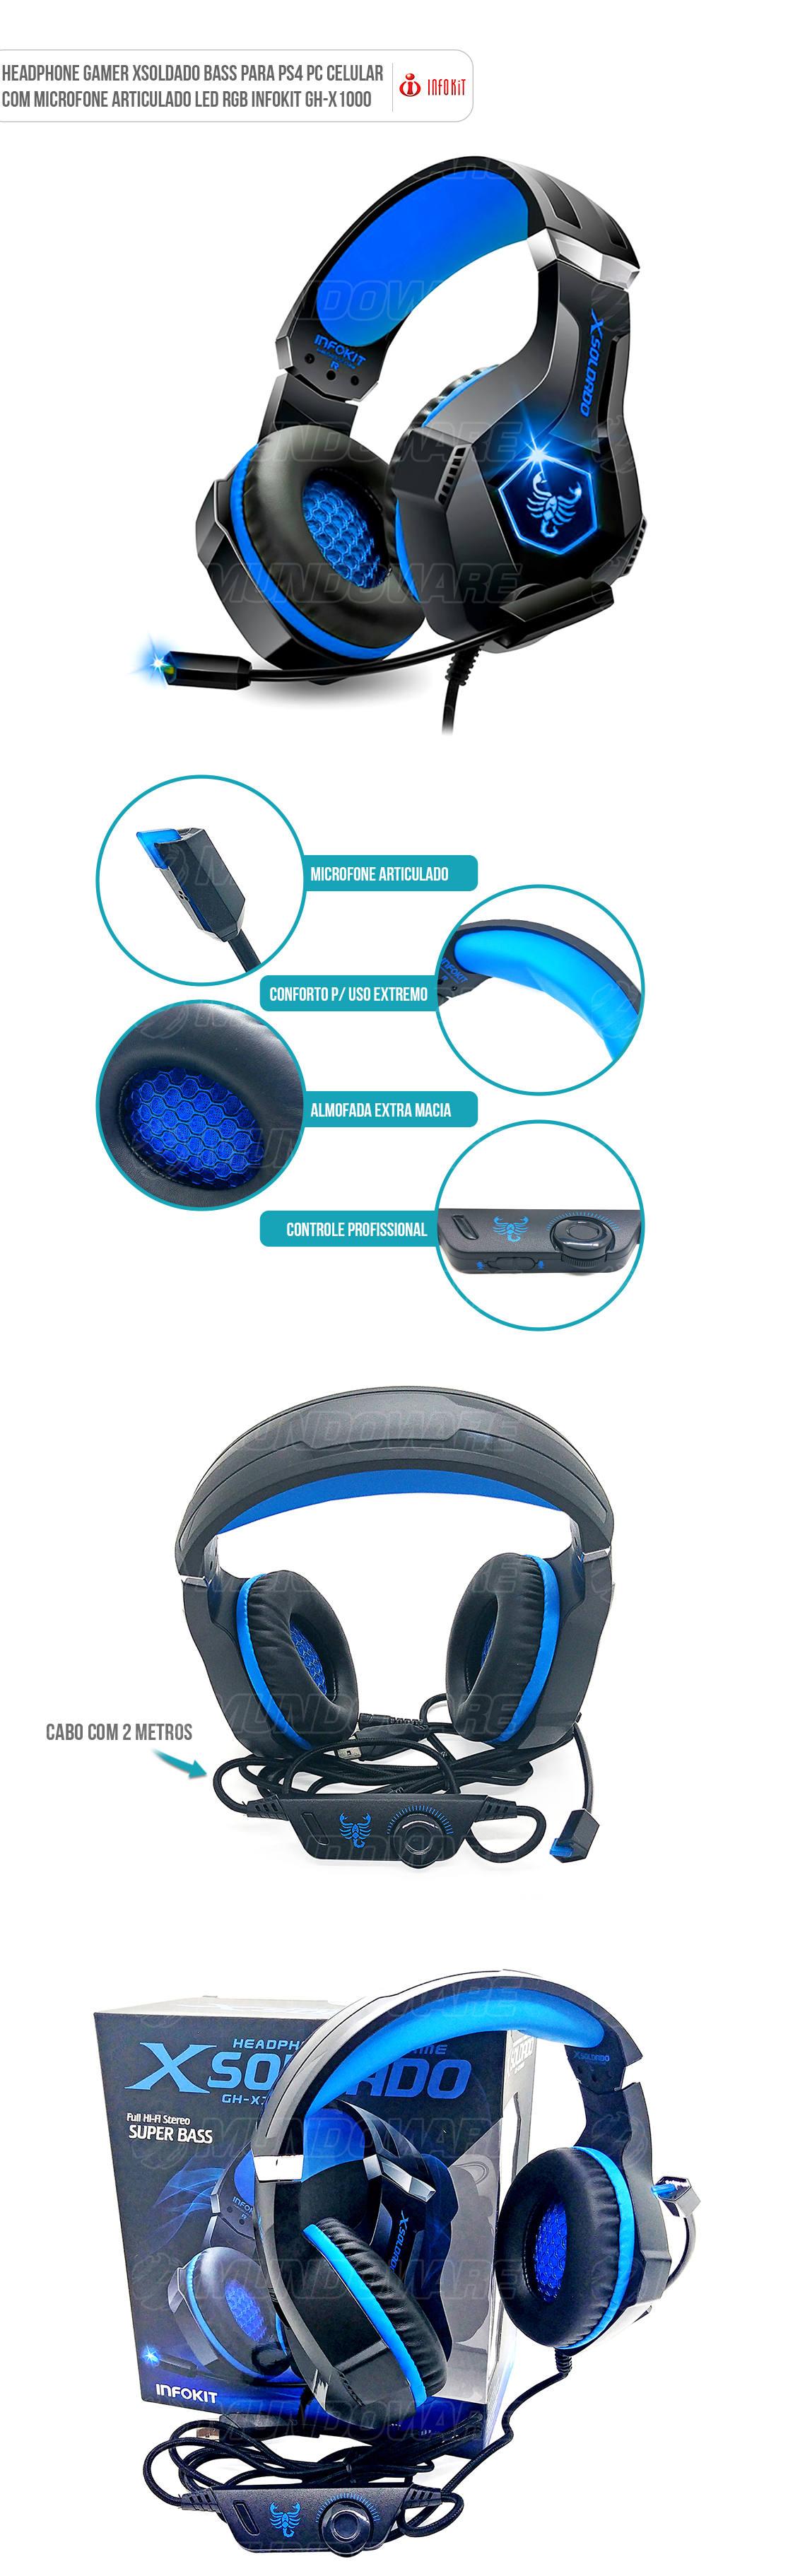 Fone Gamer com LEd Microfone Almofadado Scorpion X1000 Azul